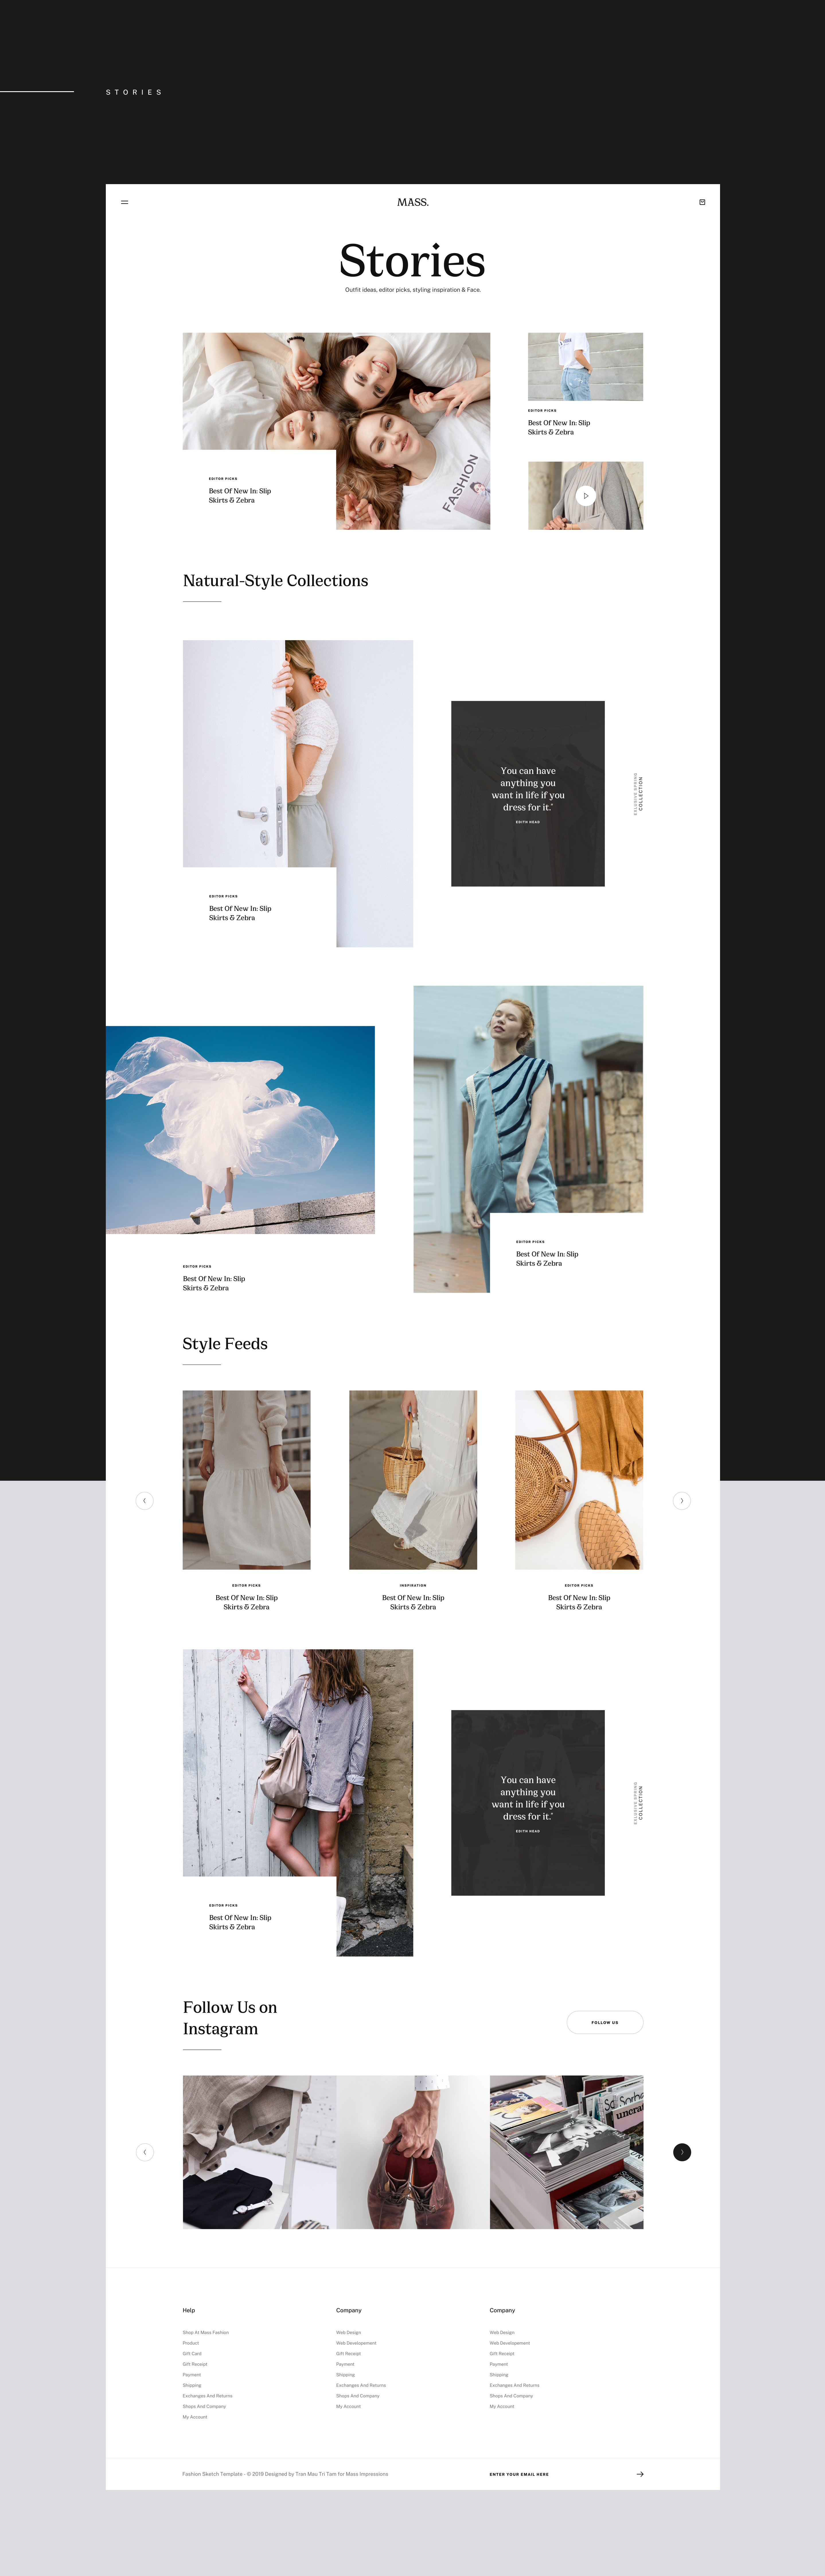 Mi Fashion Free Sketch Template Freeui Design Ui Design Freebies Free Ui Kit Icons Mockups